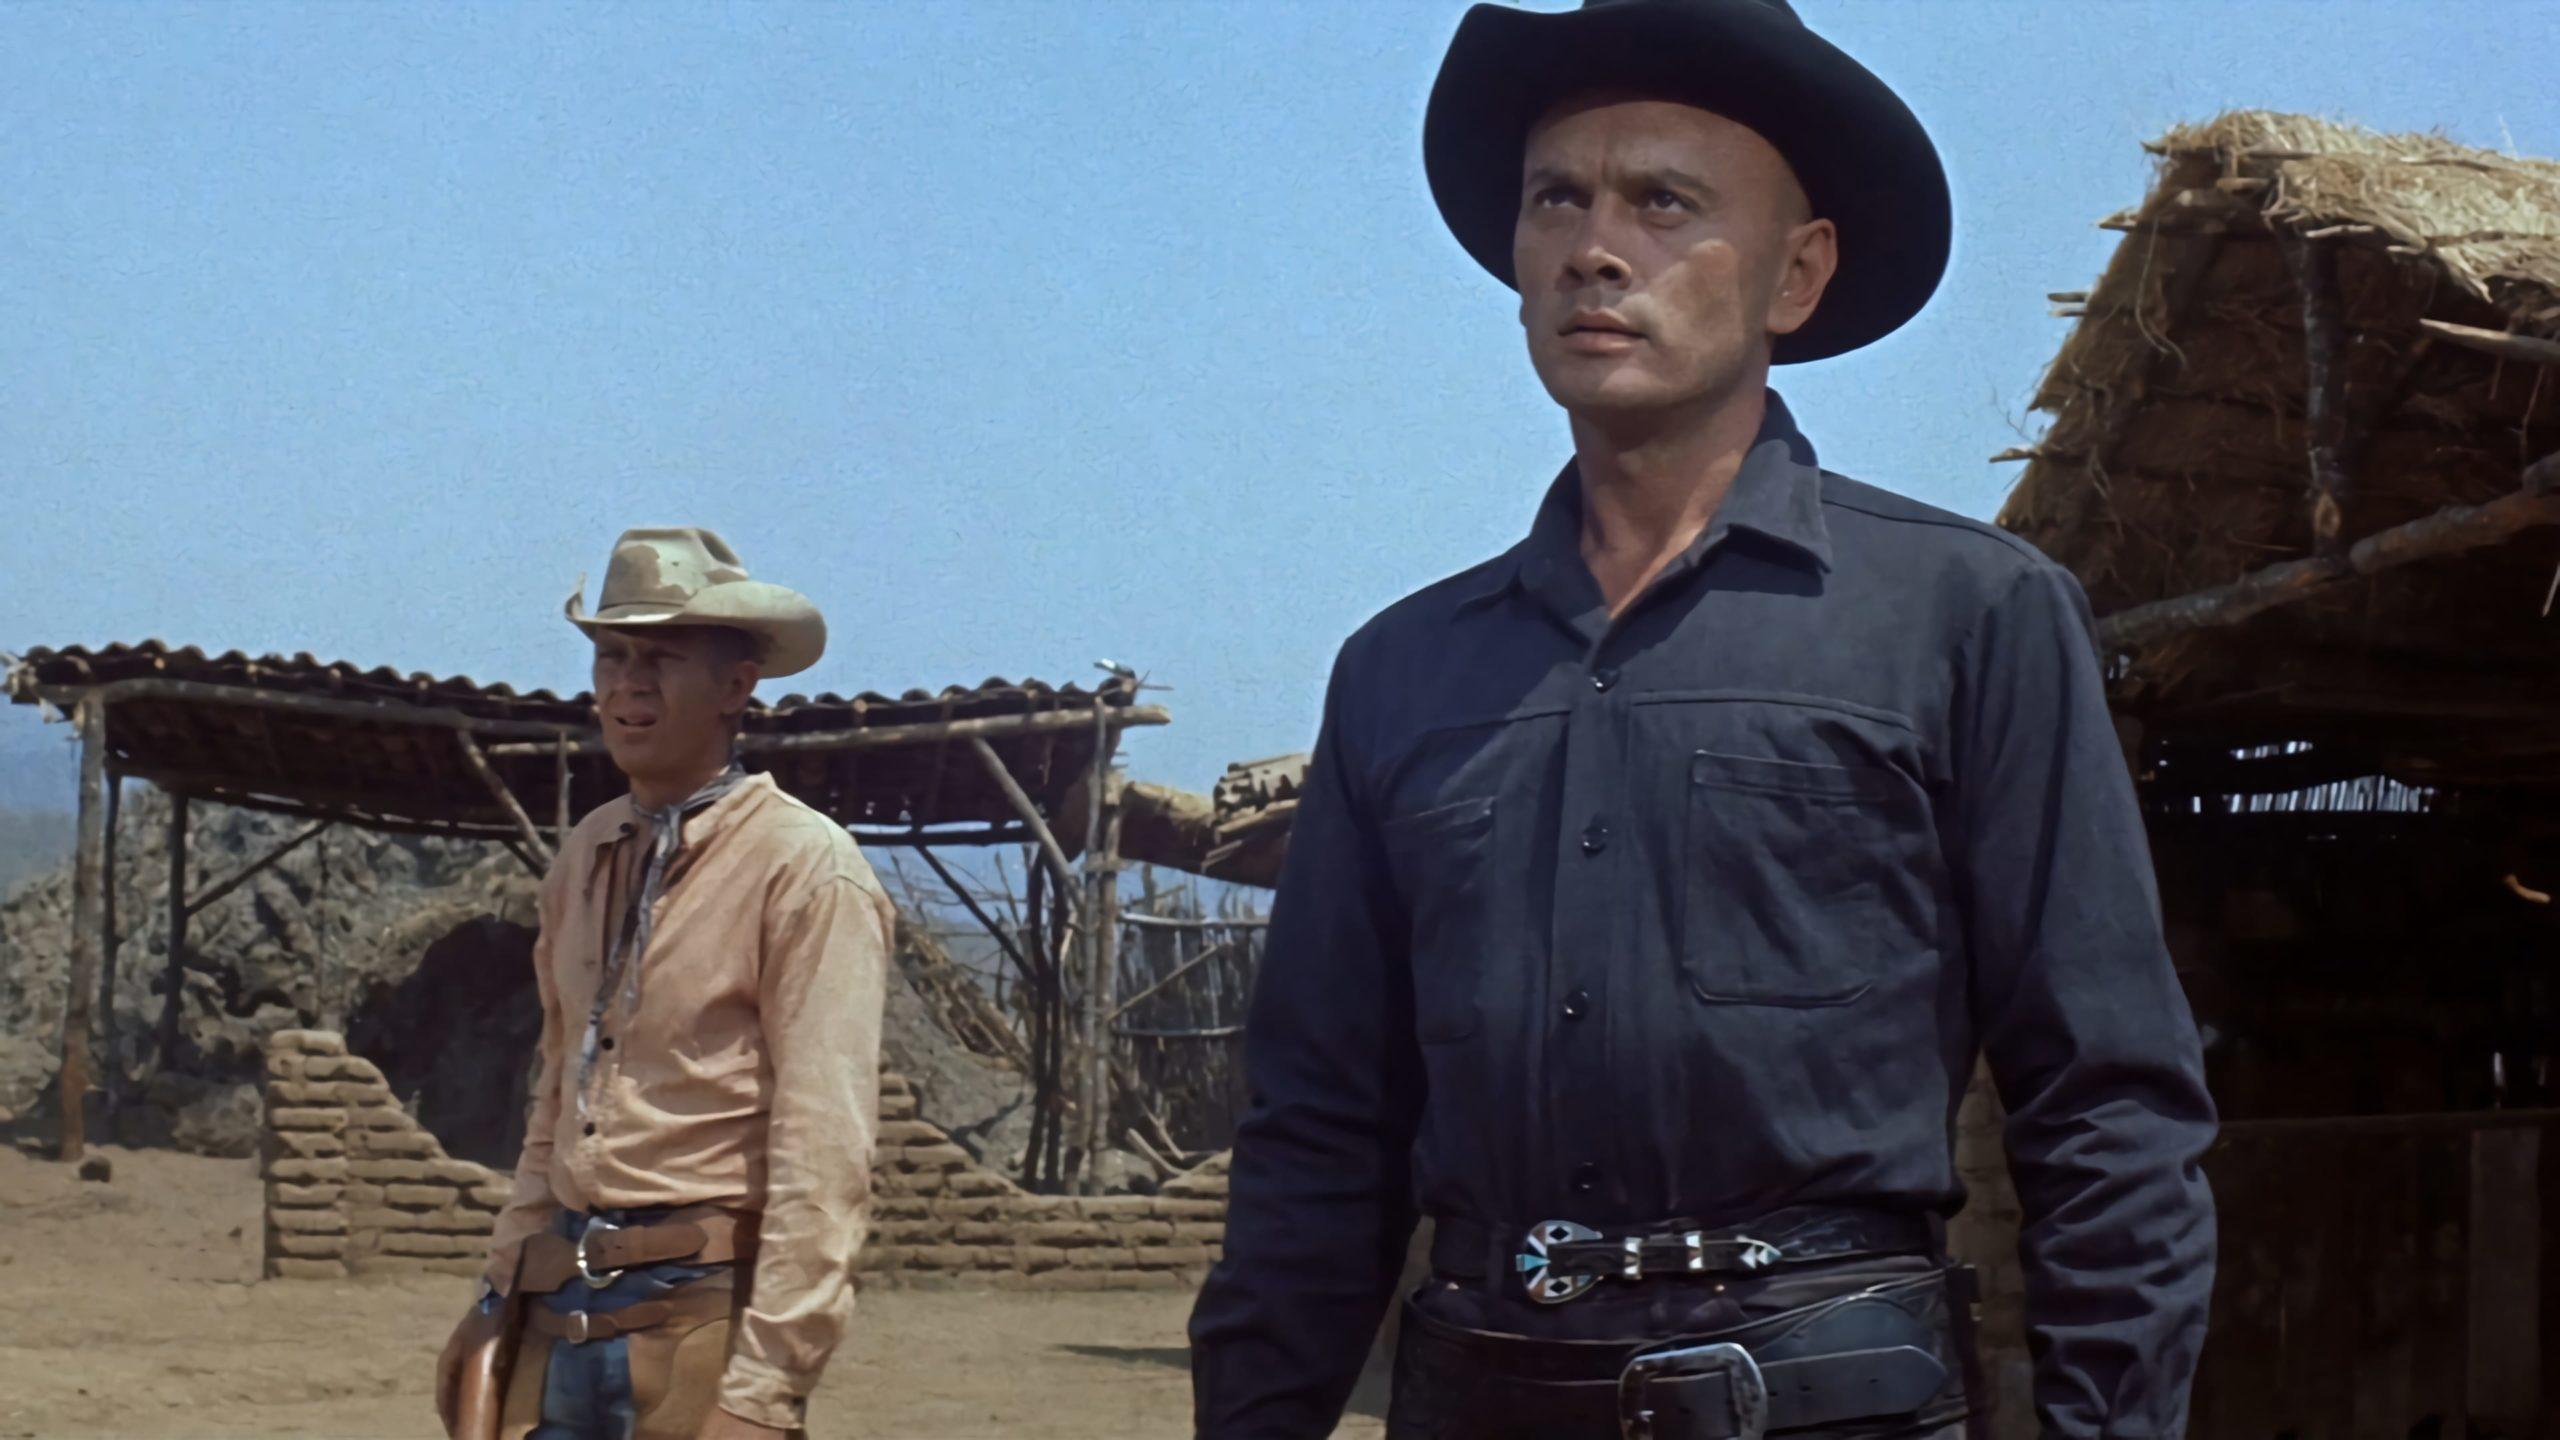 The Magnificent Seven, Original Release - October 12th, 1960